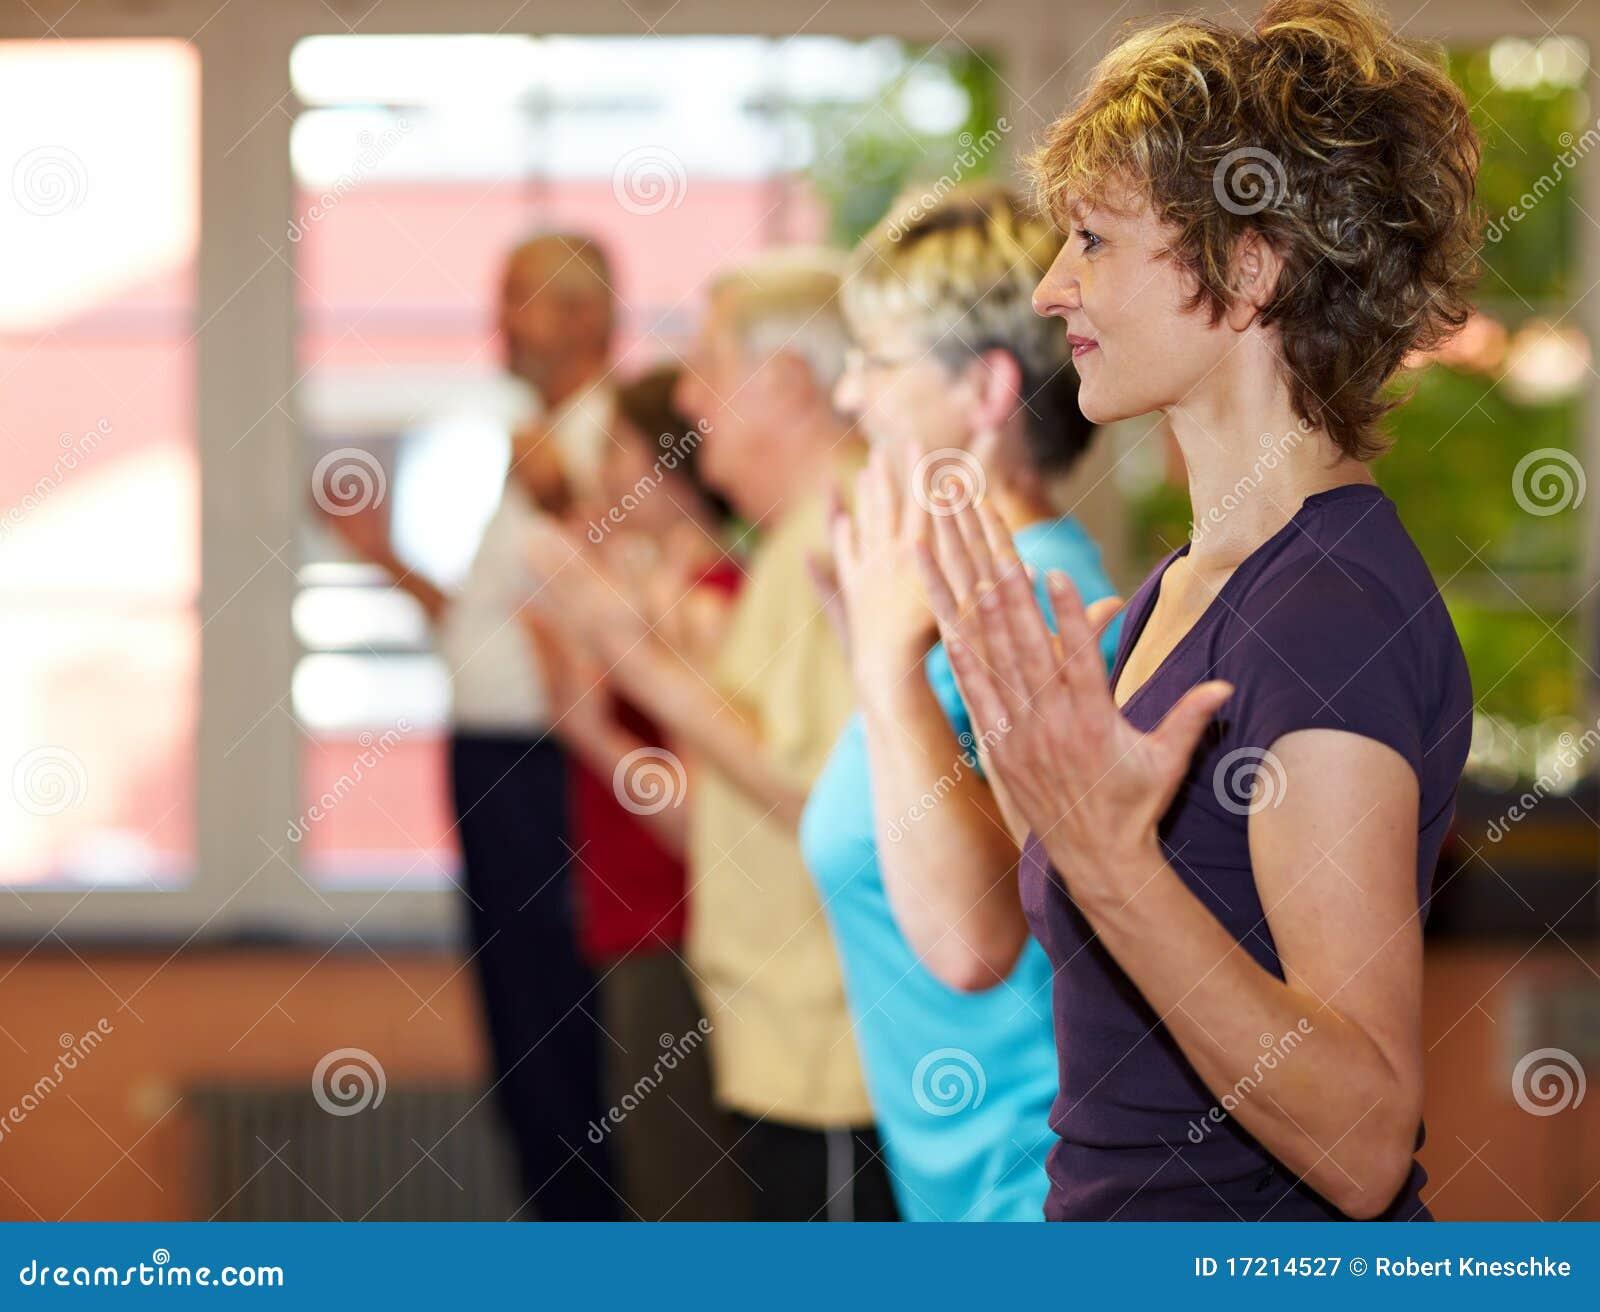 Esercitazione del gruppo in ginnastica